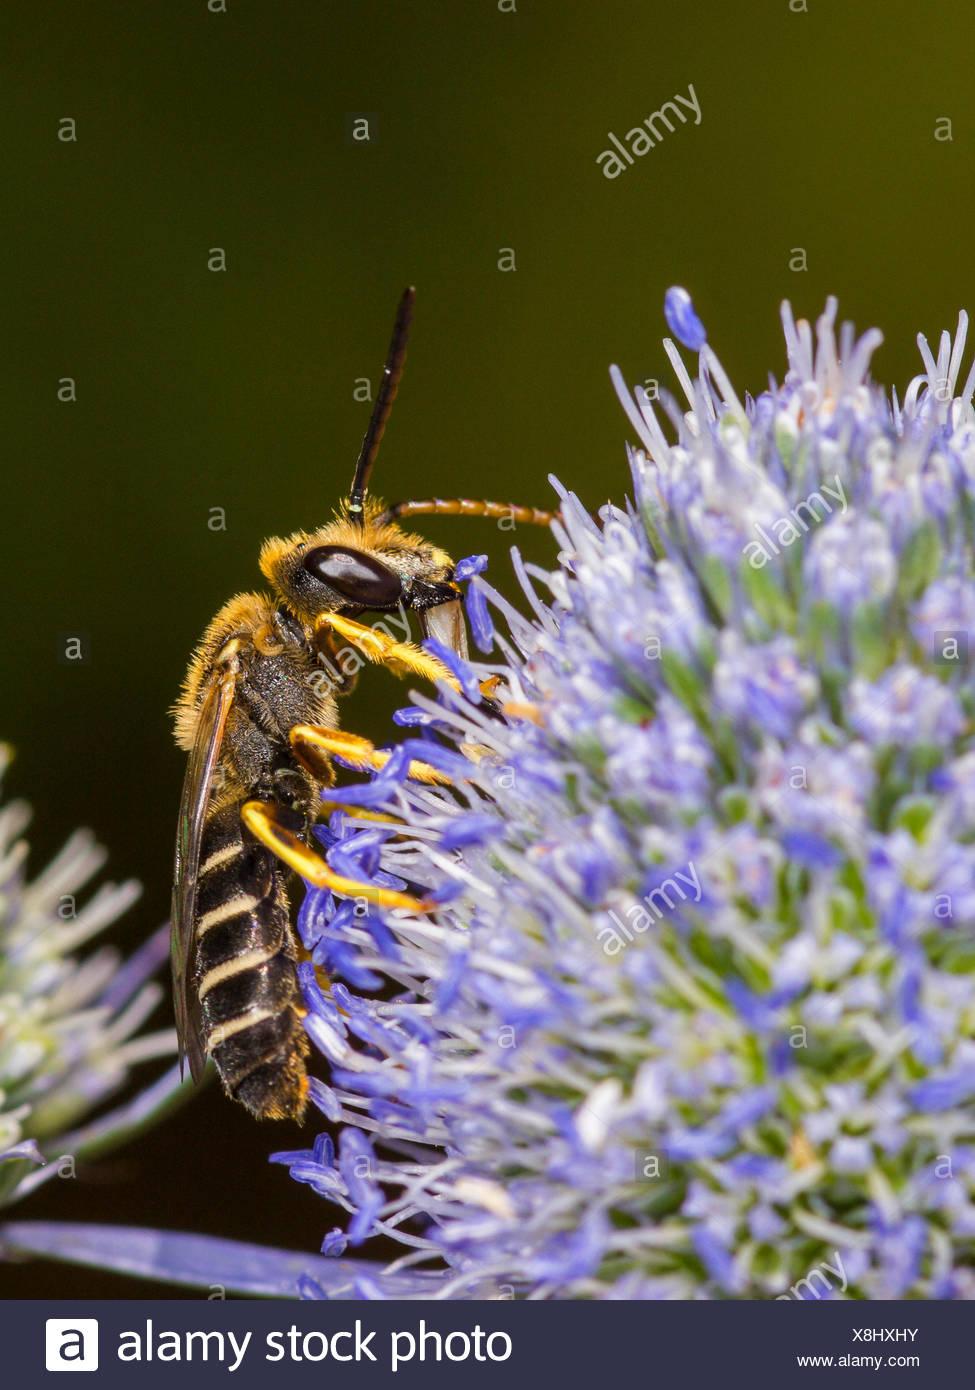 sweat bee (Halictus langobardicus), male foraging on Eryngo (Eryngium planum). , Germany - Stock Image